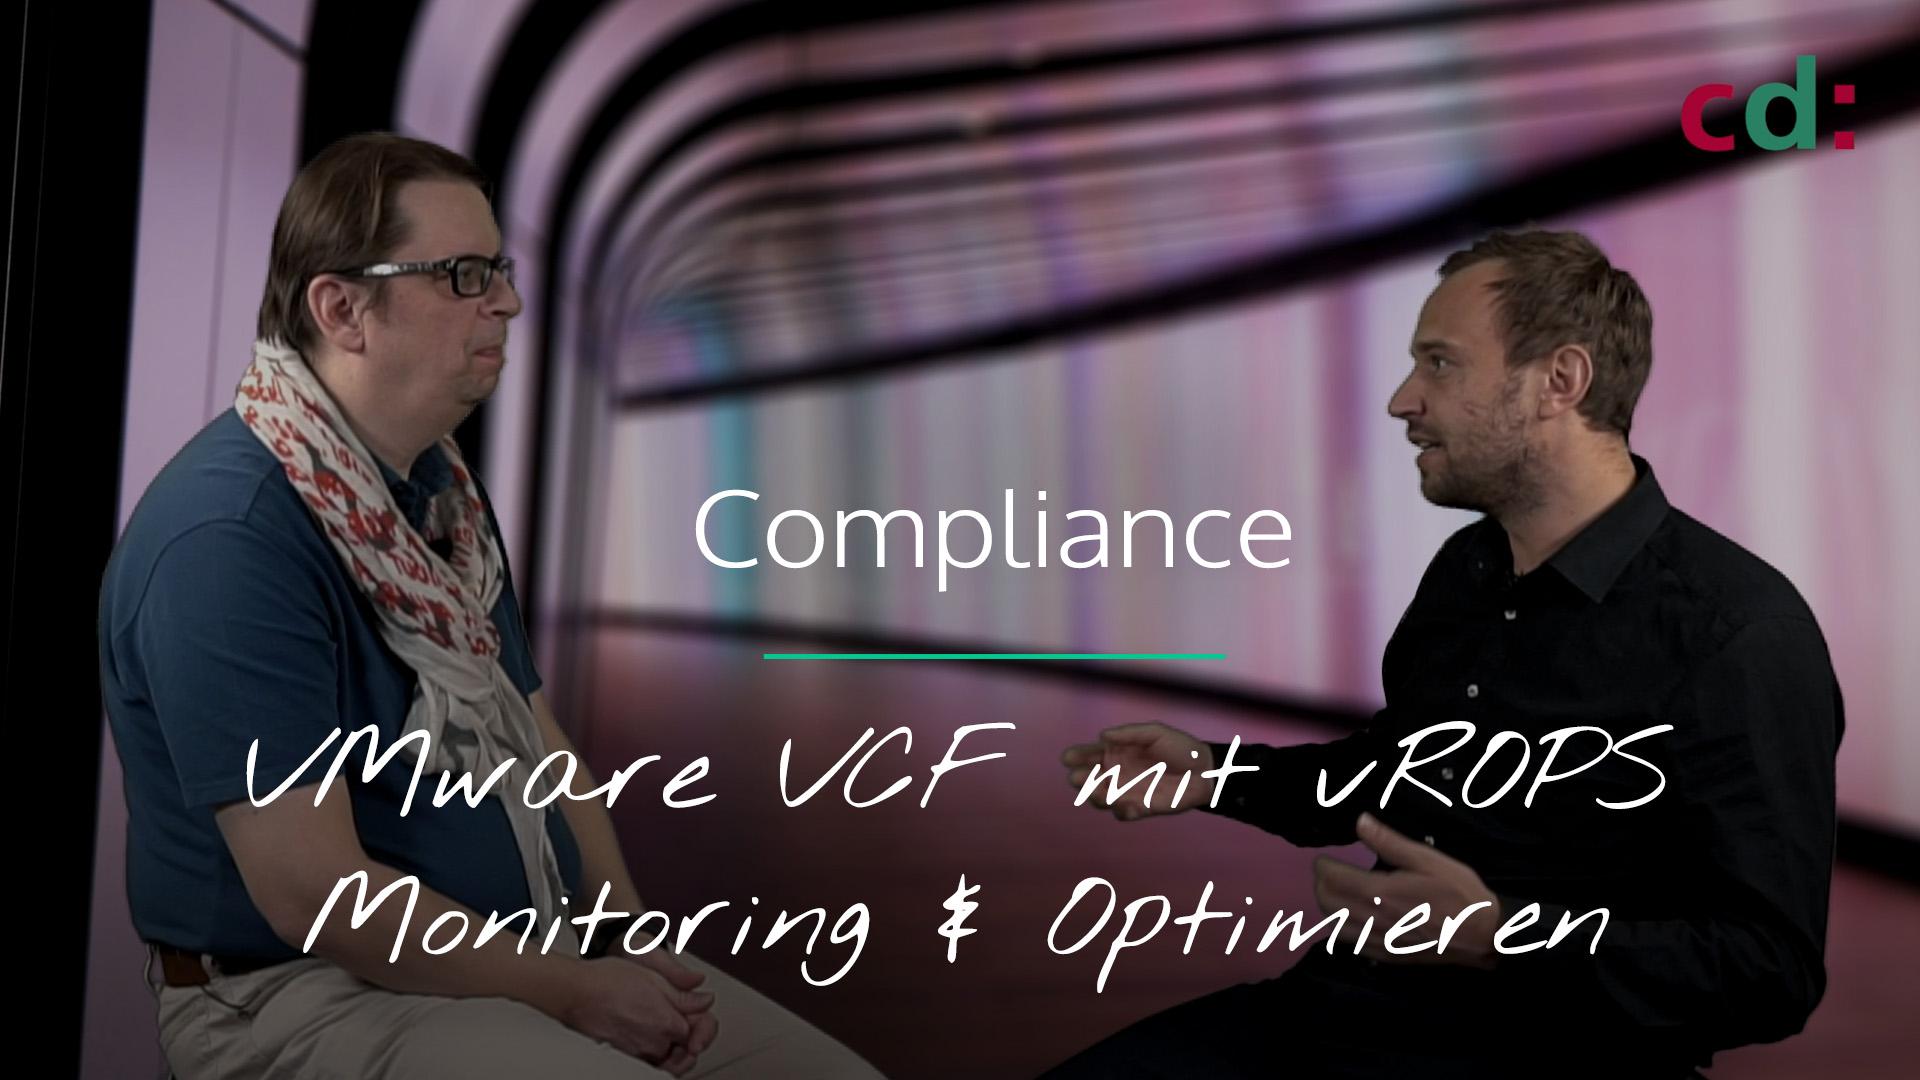 VMware VCF und vROPS - Compliance